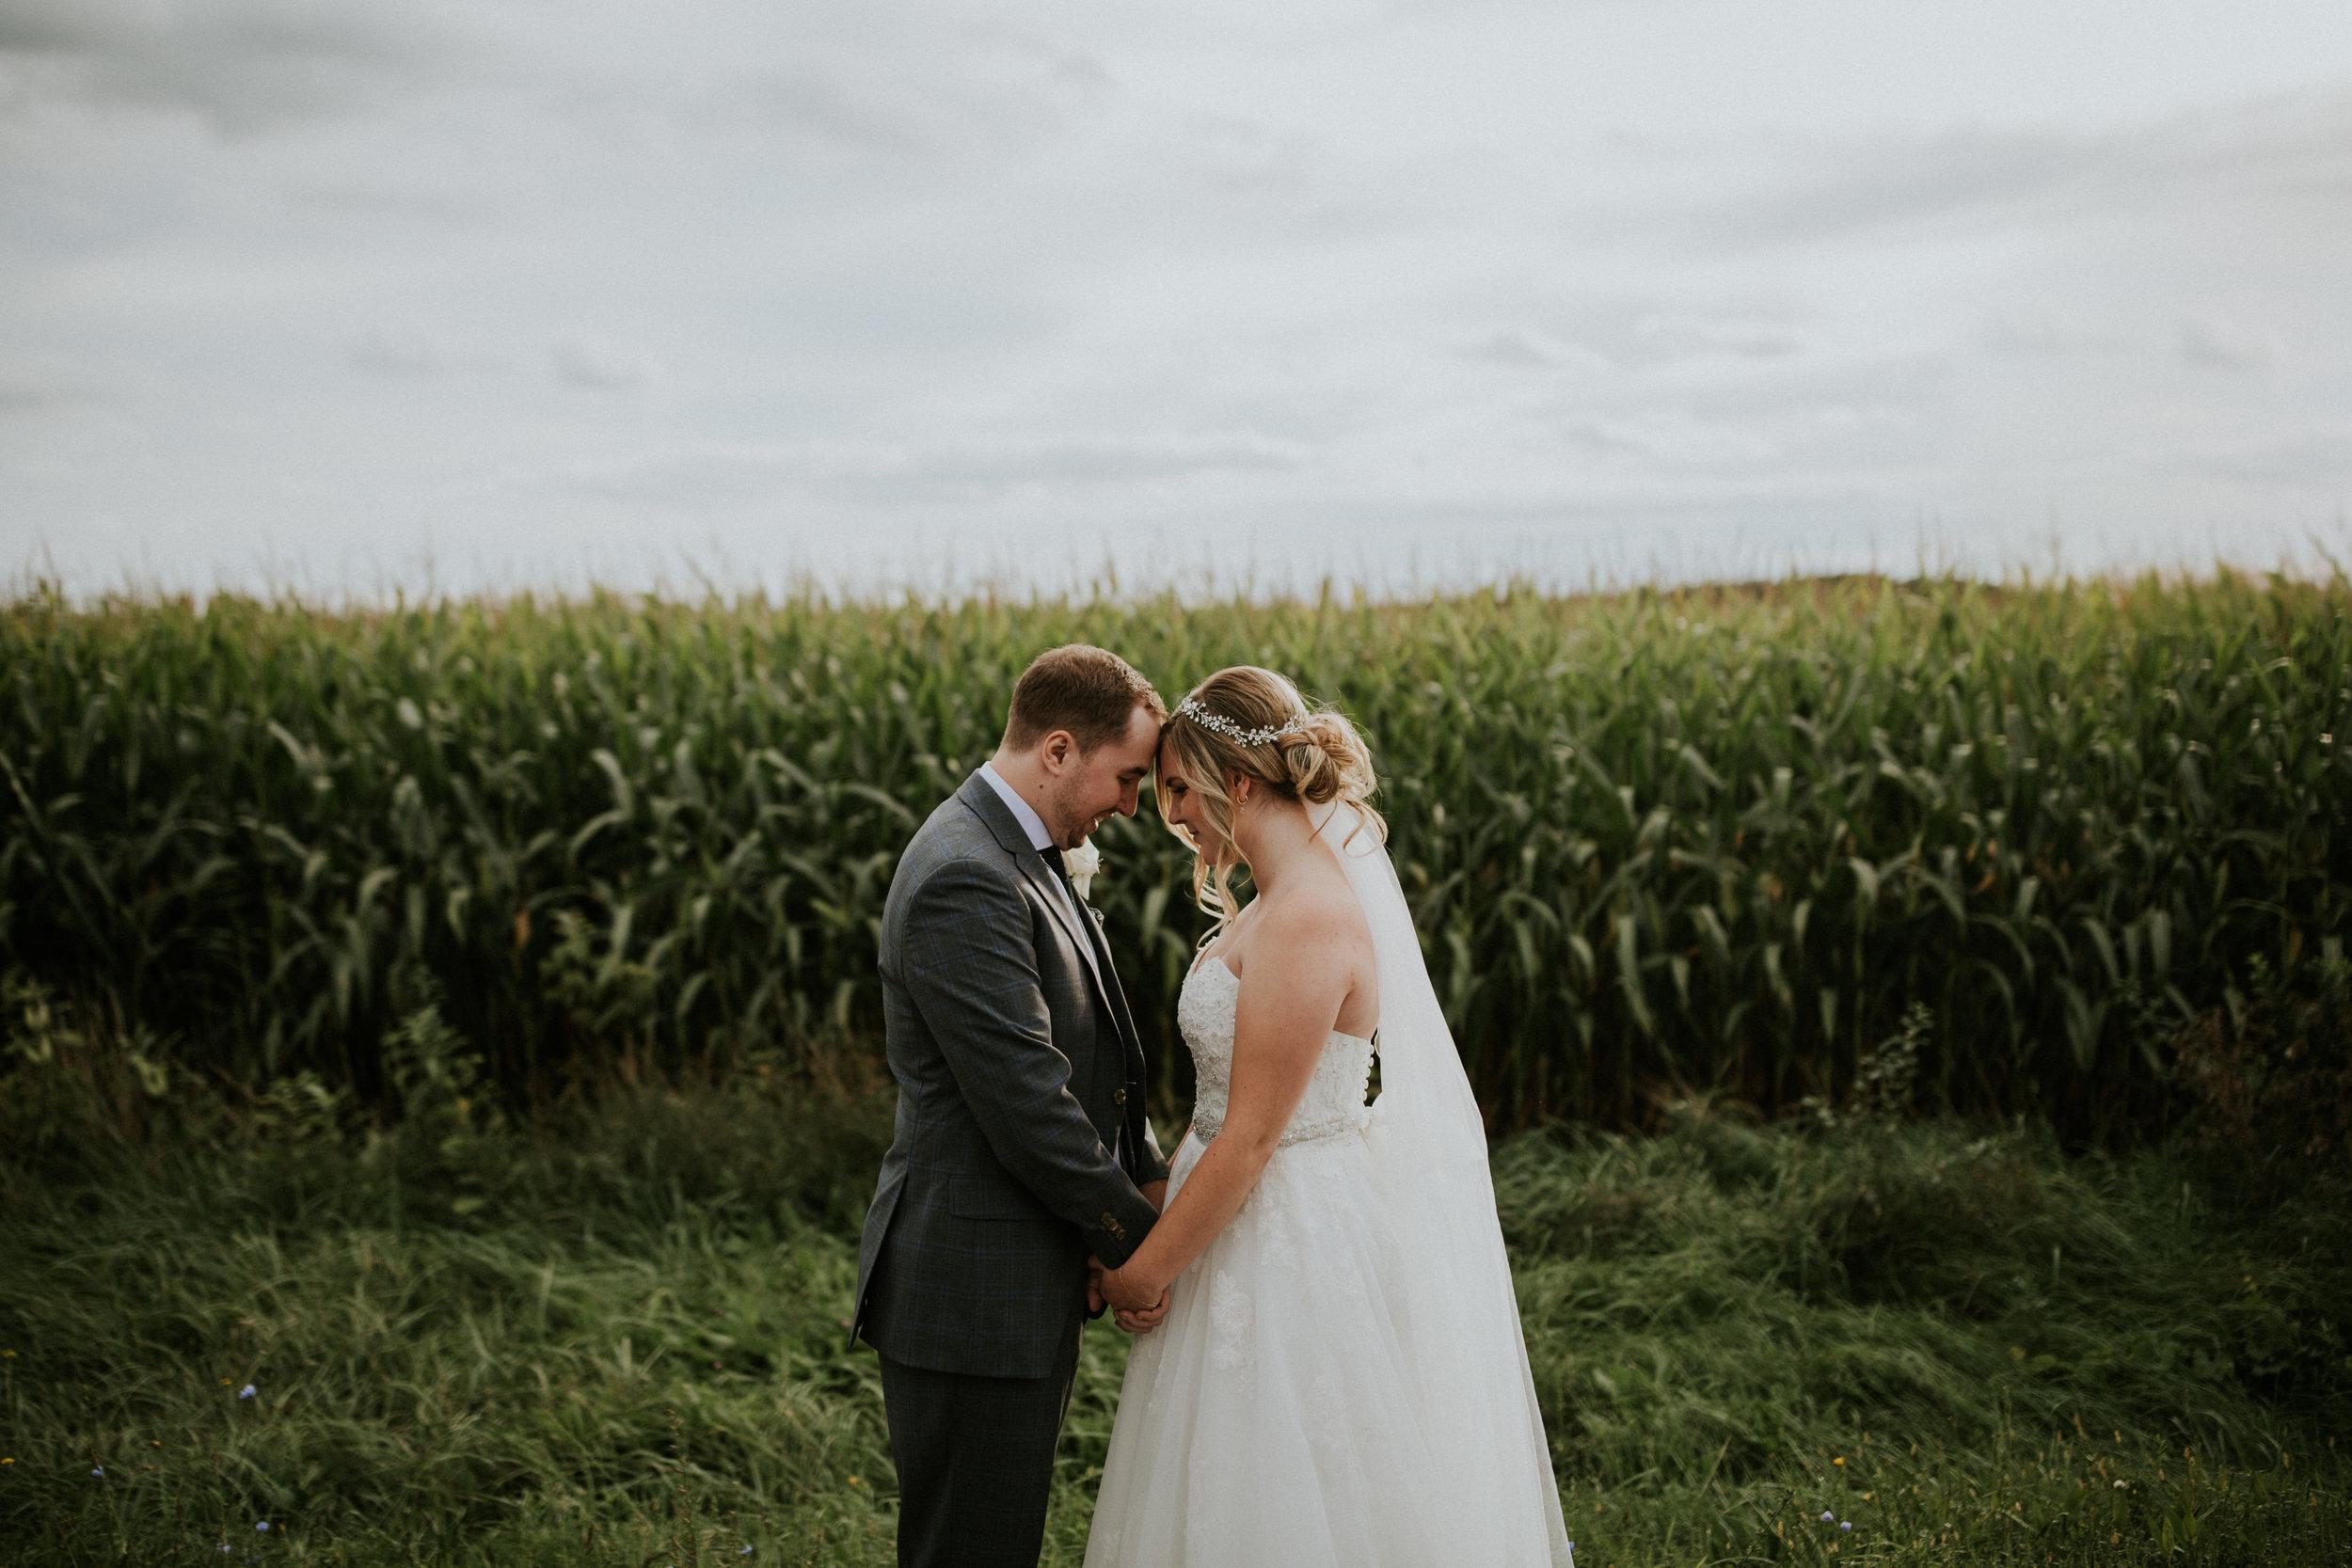 Melissa_Colin_wedding-15.jpg